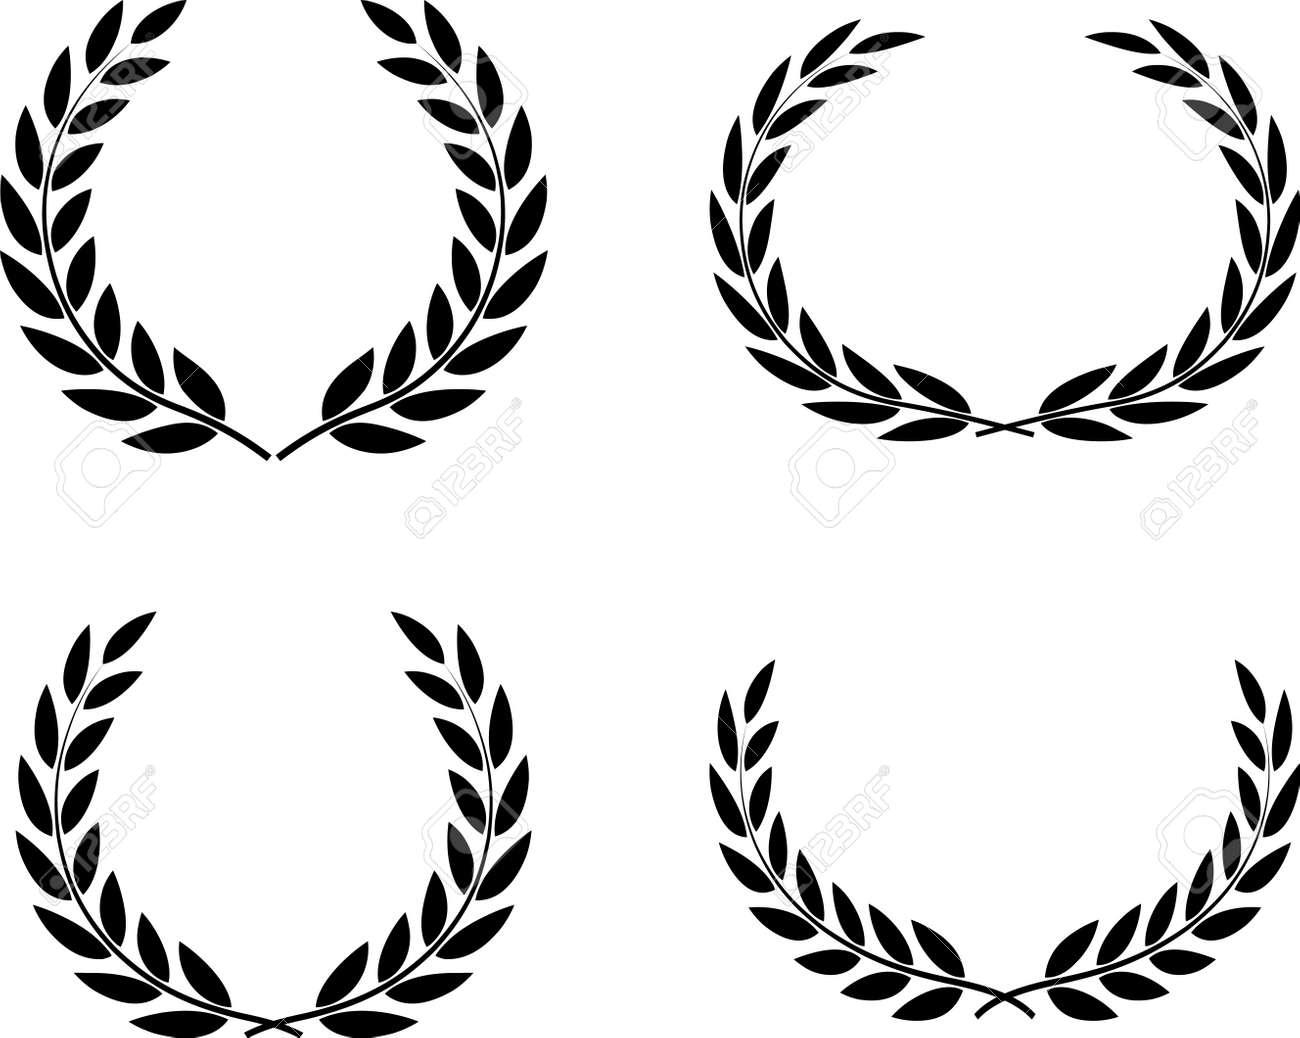 Laurel wreaths set vector isolated - 52870145